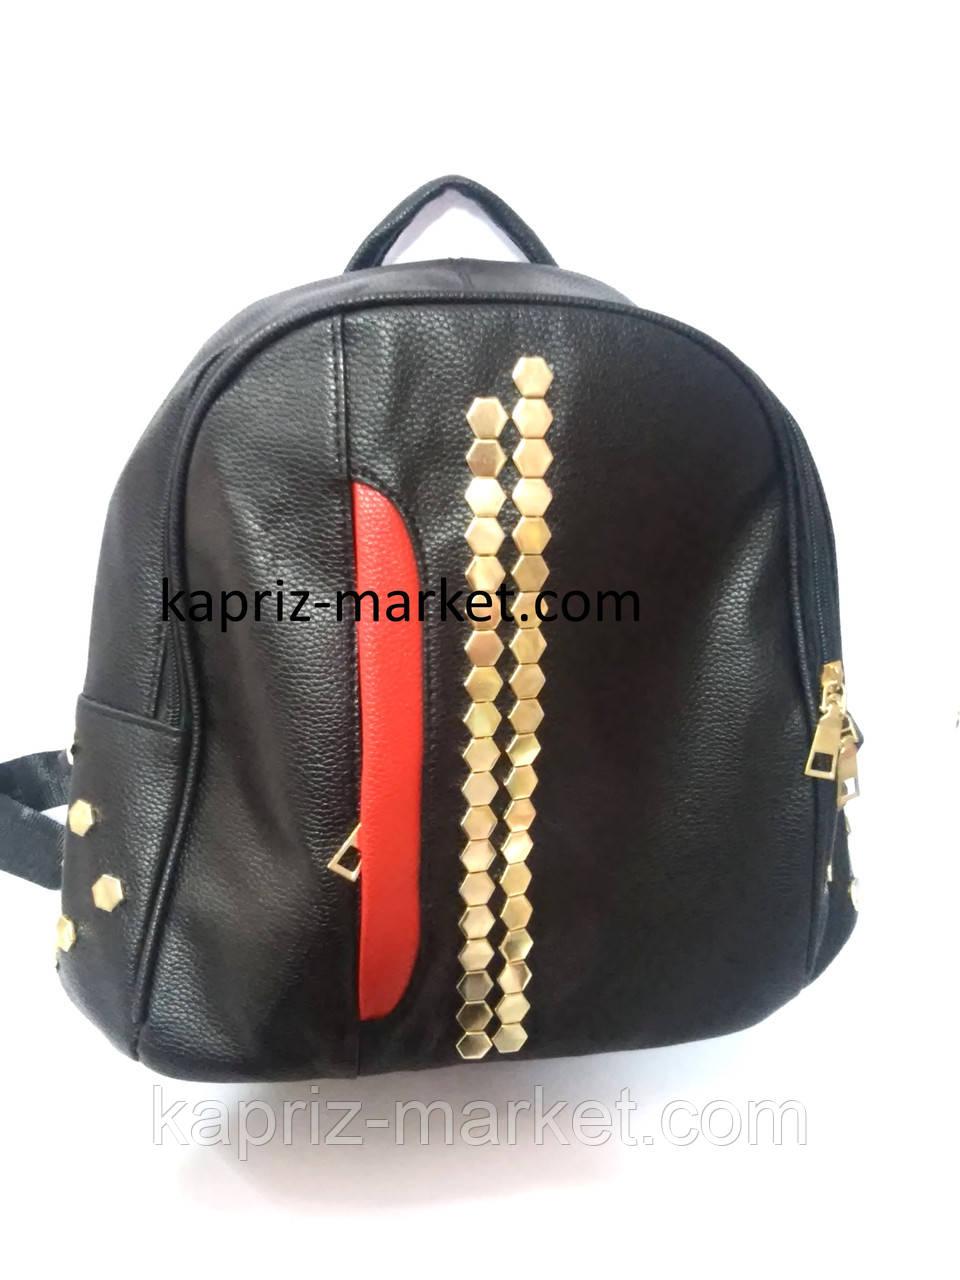 Рюкзак кожзам, среднего размера, 29см х 25см х 13см, фото 1